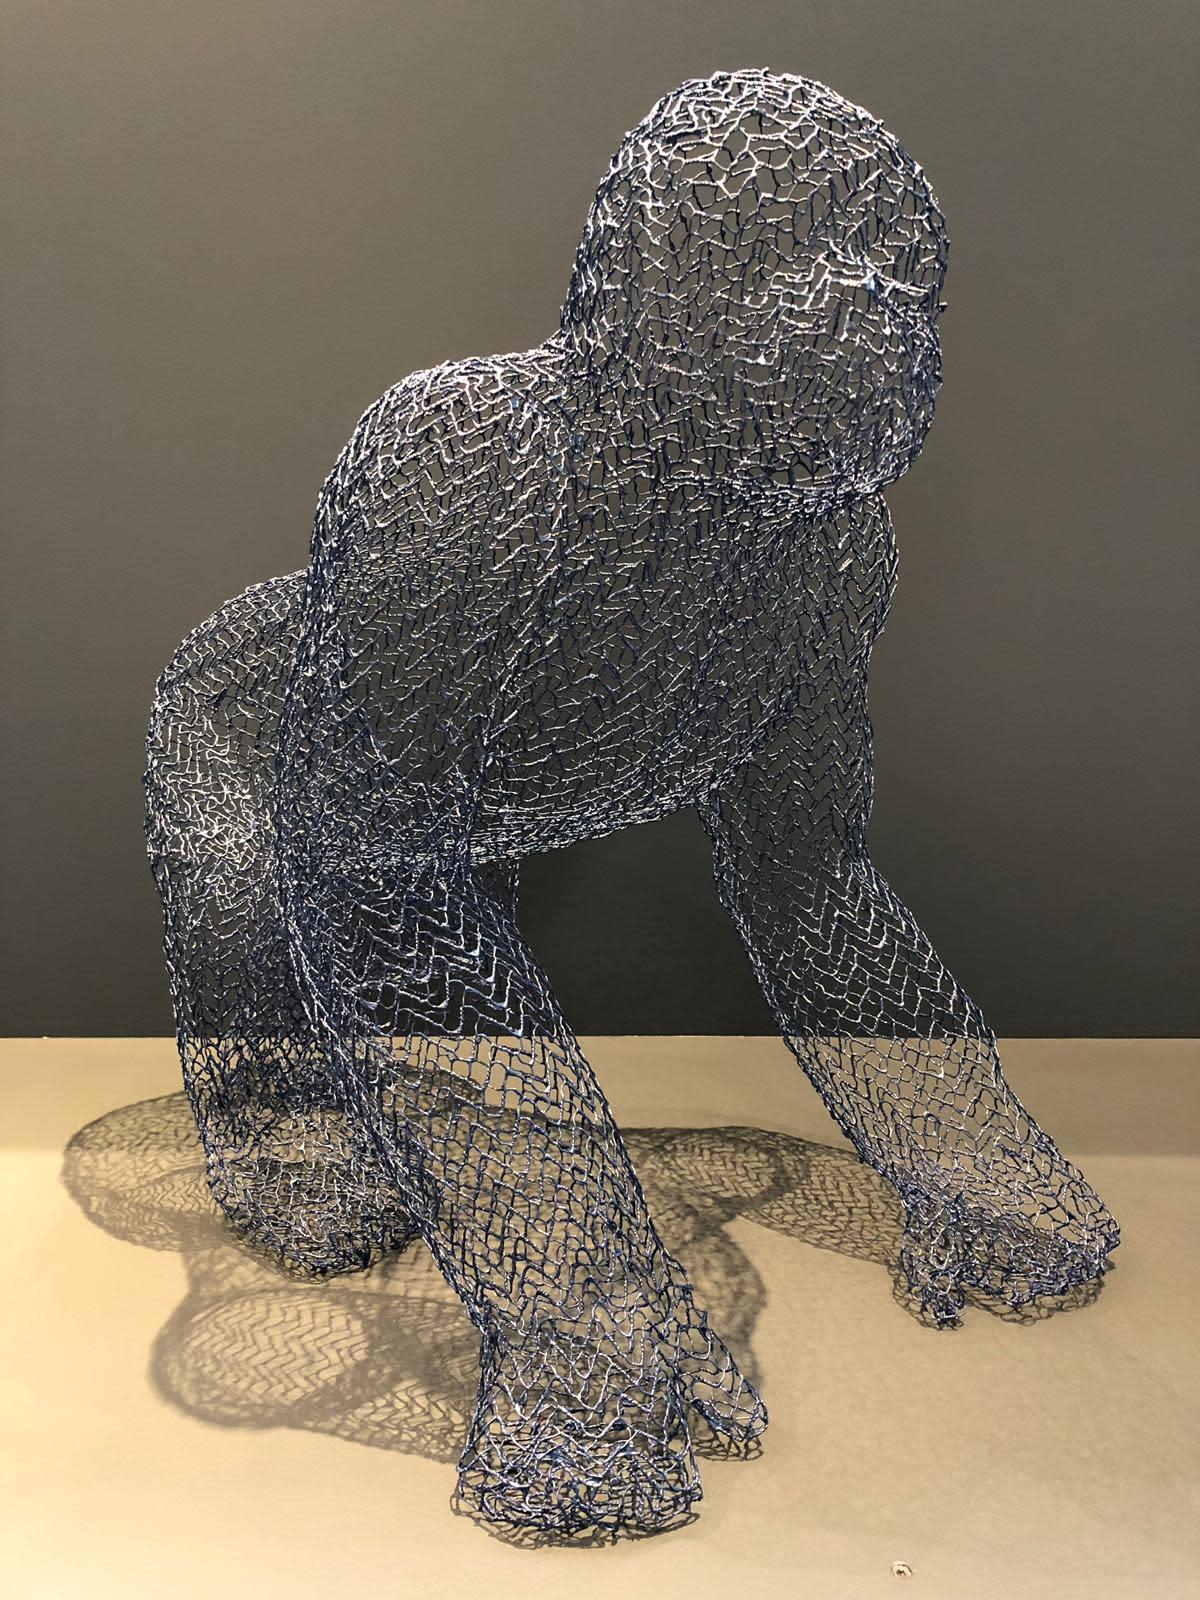 <span class=&#34;link fancybox-details-link&#34;><a href=&#34;/content/viewing-room/22/artworks5229/&#34;>View Detail Page</a></span><div class=&#34;artist&#34;><strong>Eka Acosta</strong></div><div class=&#34;title&#34;><em>Baby Gorilla</em>, 2019</div><div class=&#34;medium&#34;>Mesh wire</div><div class=&#34;dimensions&#34;>70 x 40 x 60 cm</div>€ 4,500.00